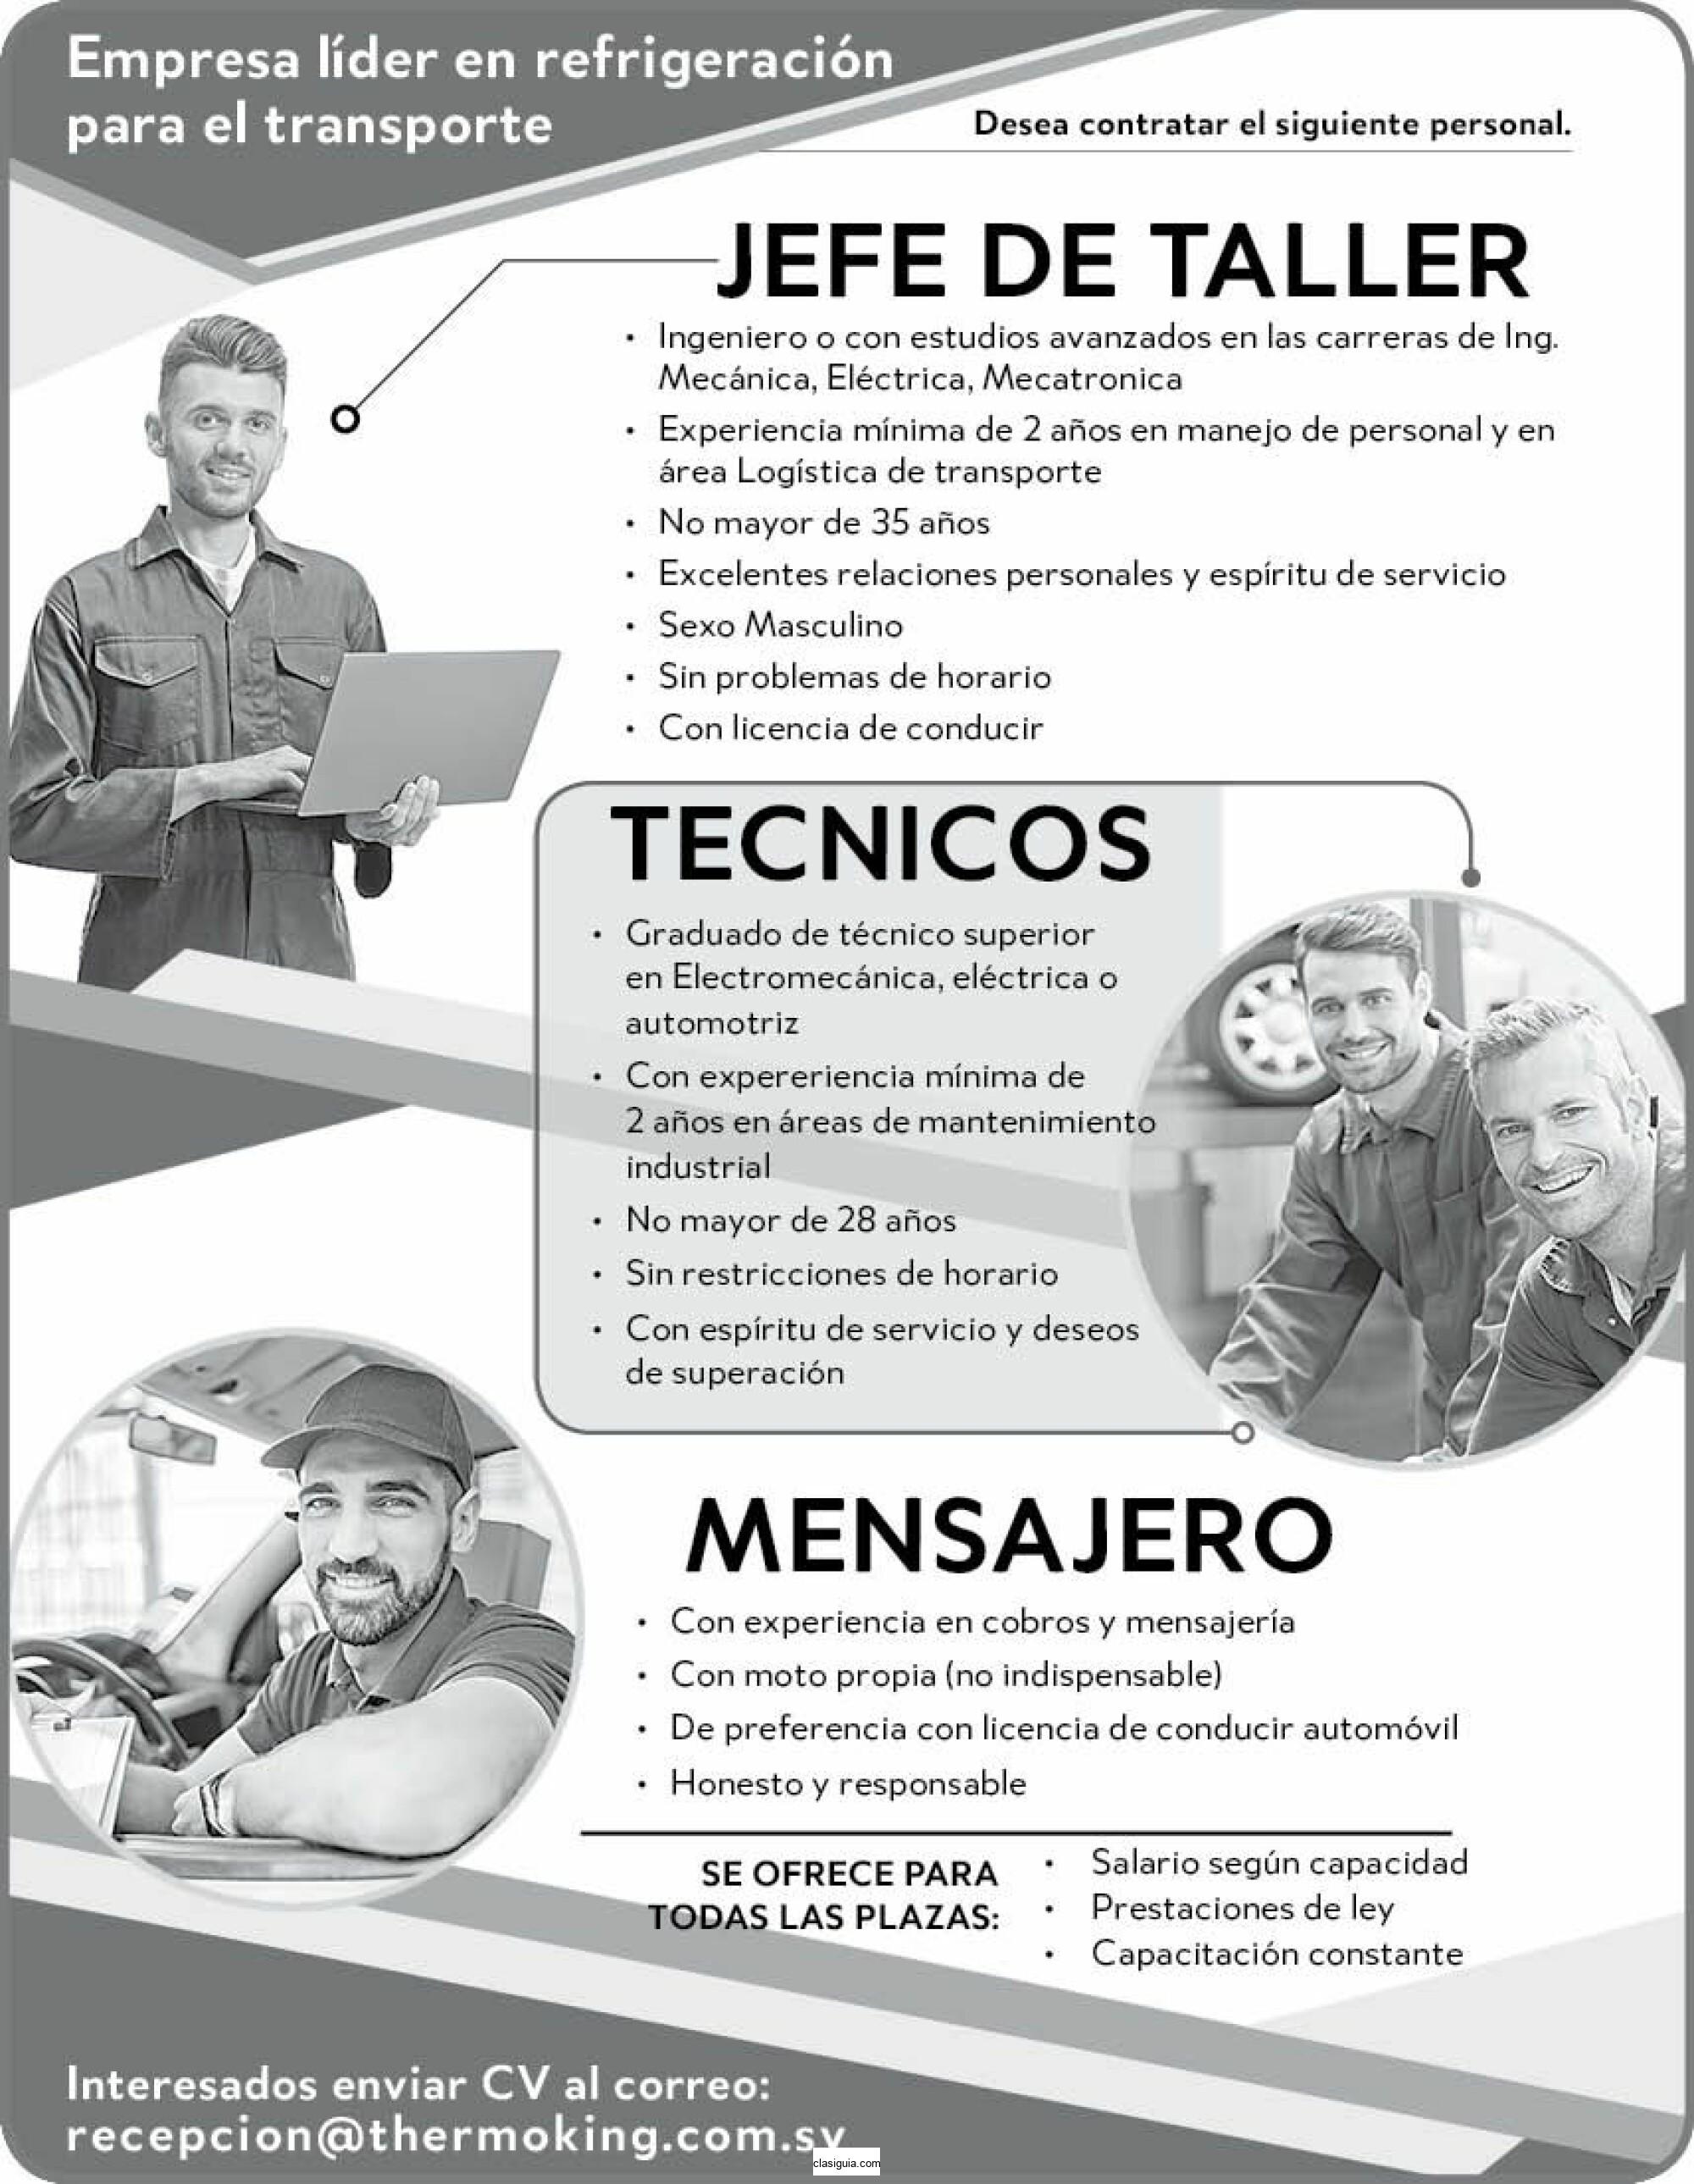 JEFE DE TALLER/ TECNICOS / MENSAJEROS